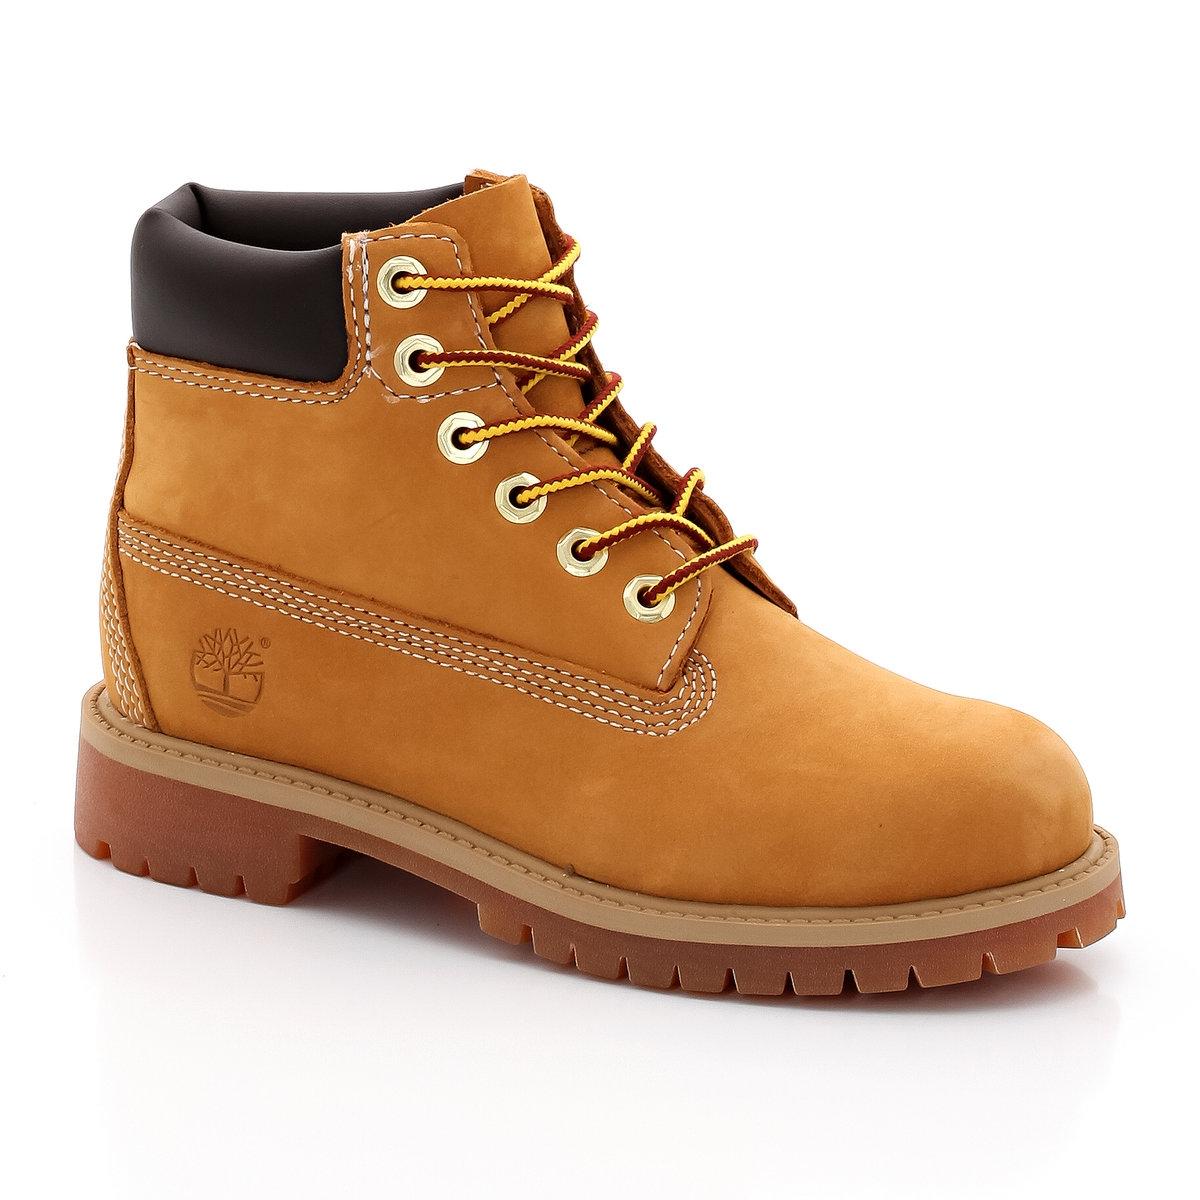 Boots nabuck 6 In Premium